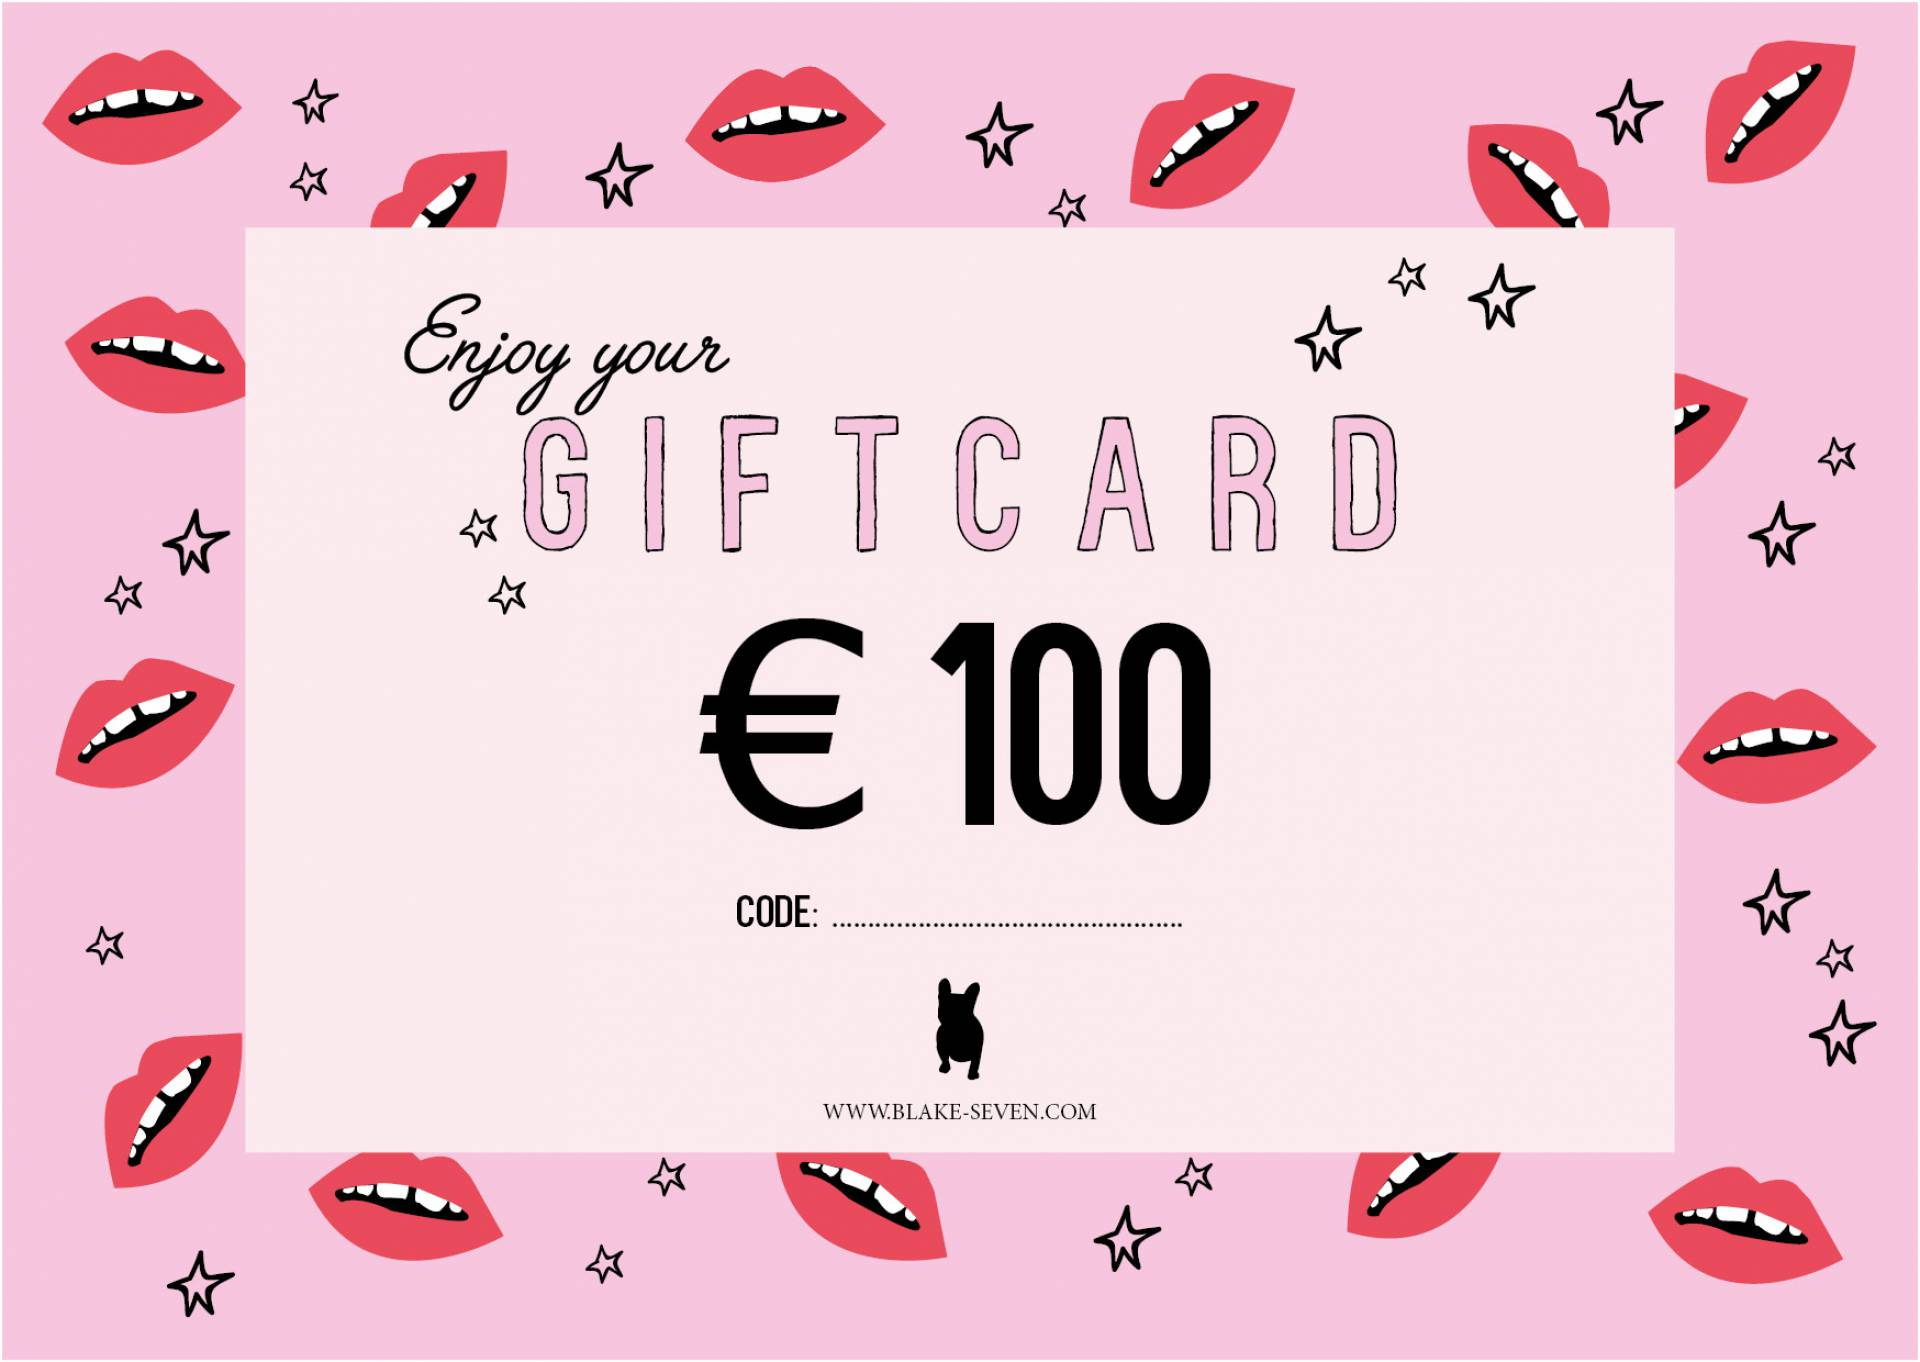 Giftcard 100 Euro Blake Seven